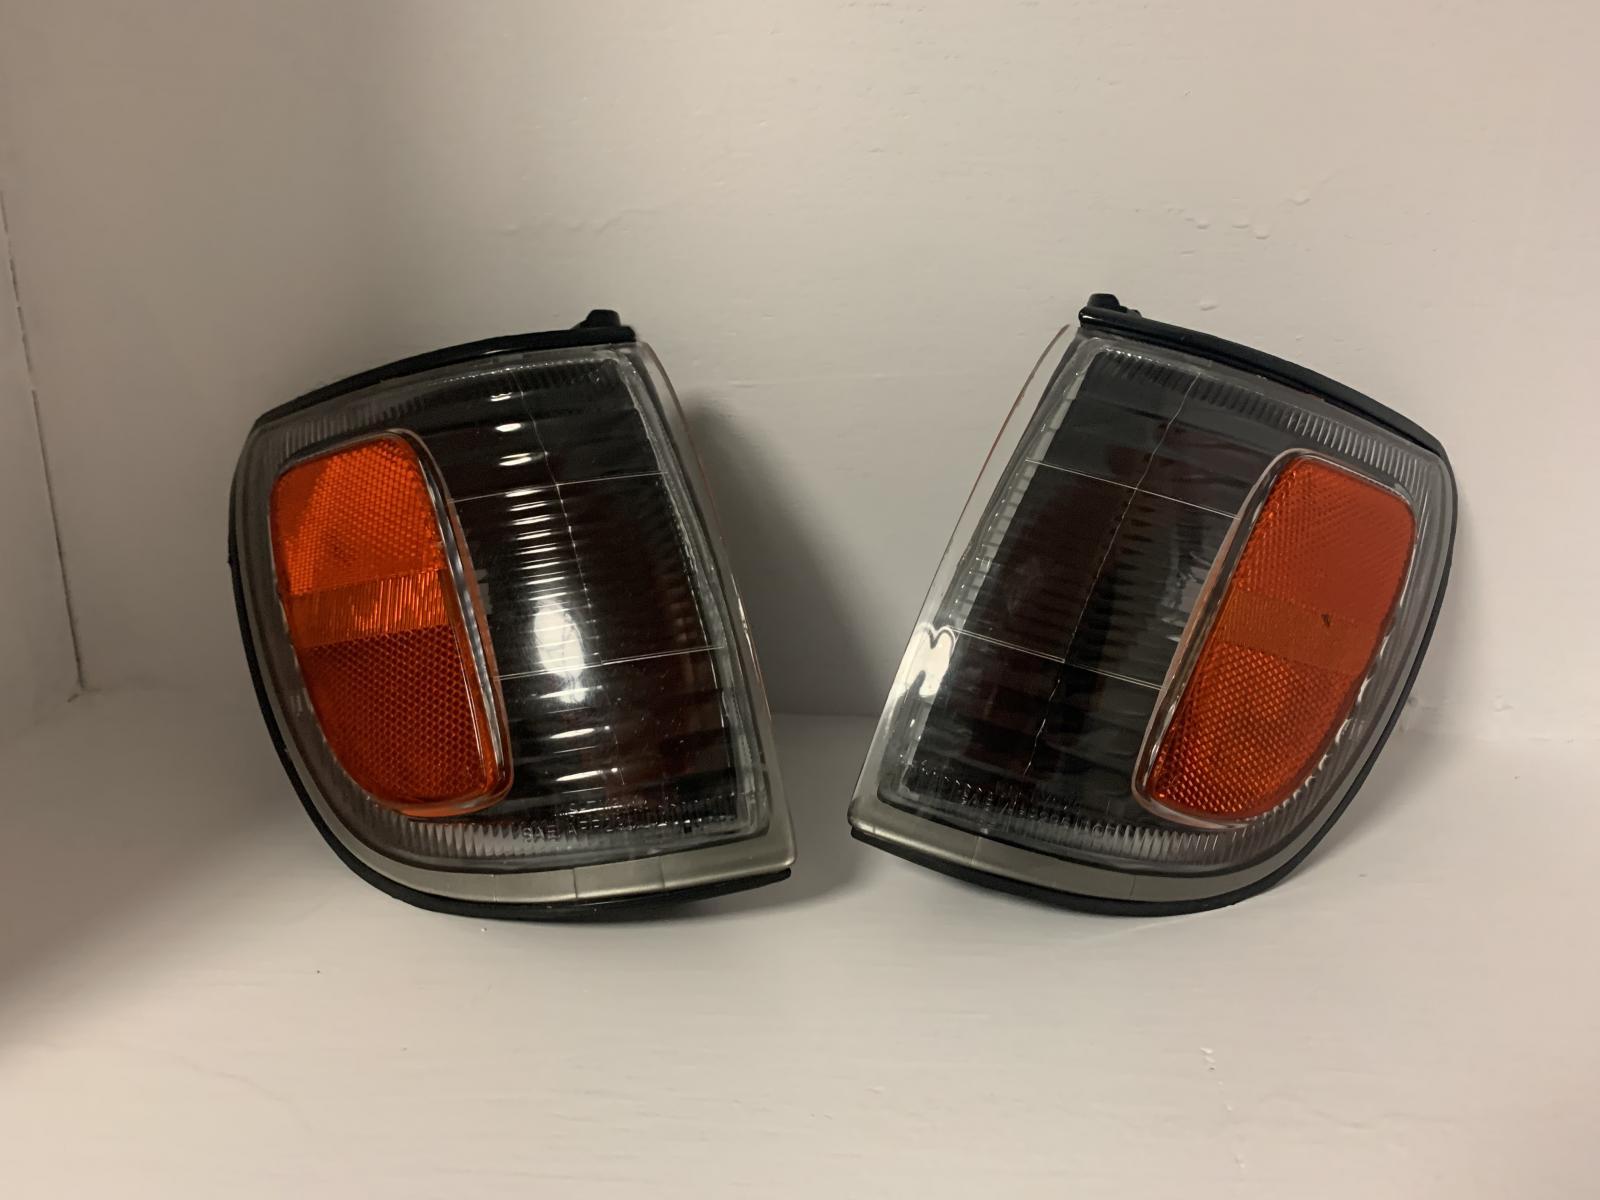 FS: 45 shipped 1996-2002 Toyota 4Runner Smoked/ Clear Lense Corner Lights 45 shipped-331fc263-f7a9-448d-aa33-9ca06657d338-jpg